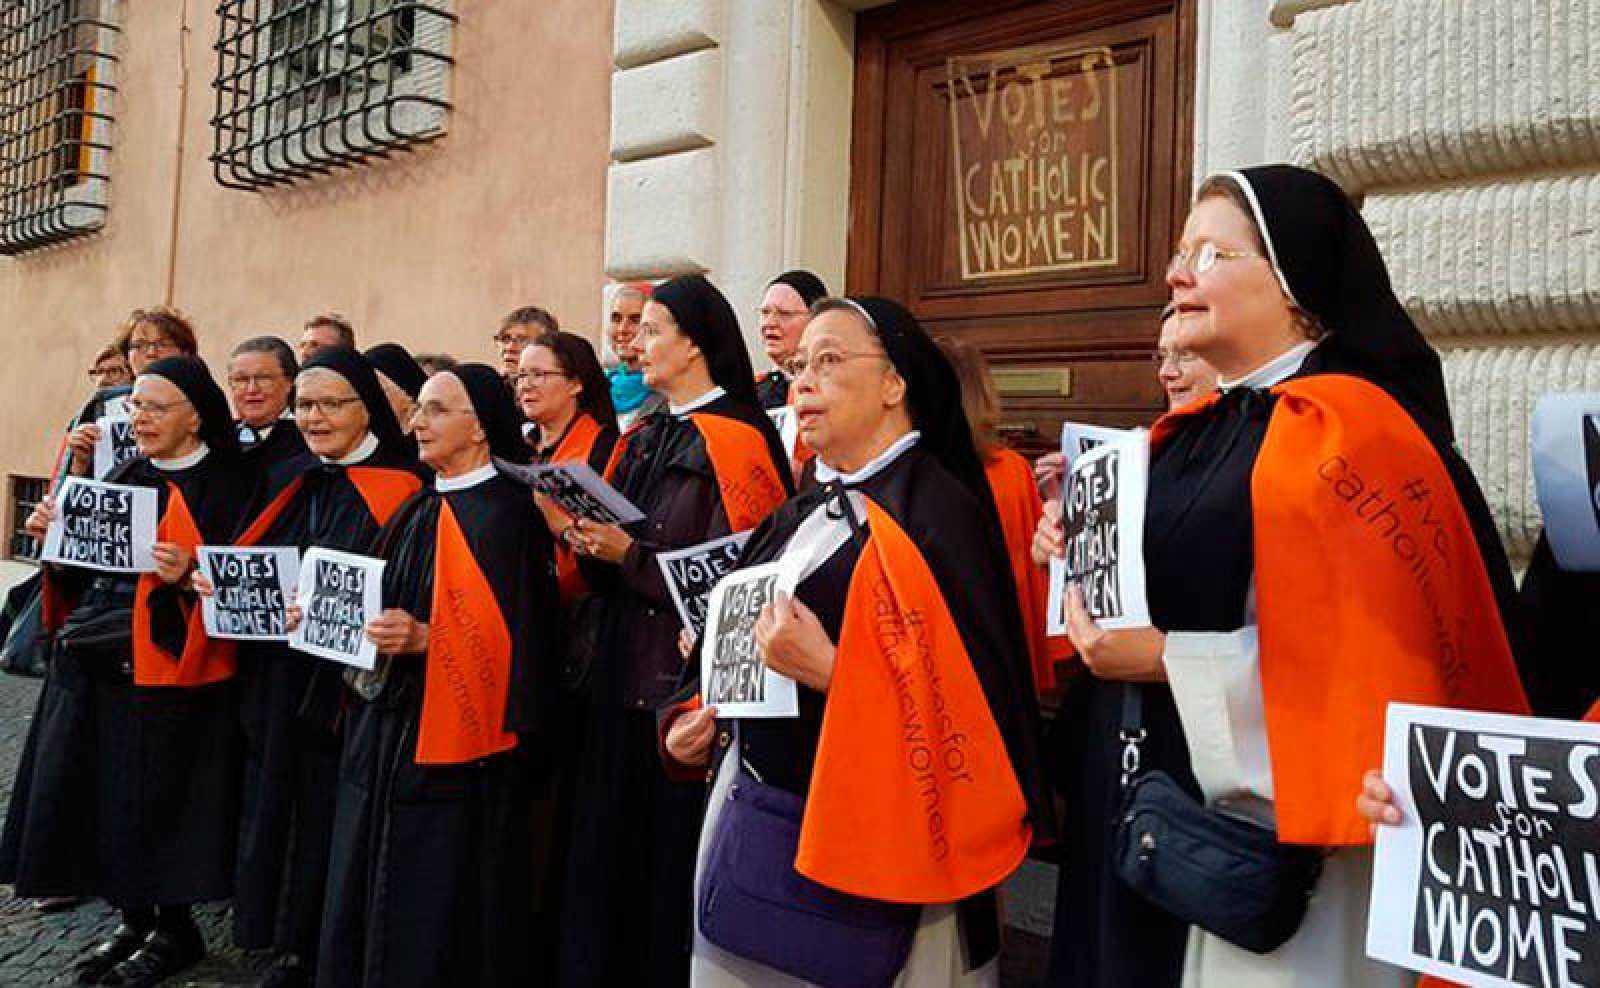 Mujeres piden voto en la Iglesia